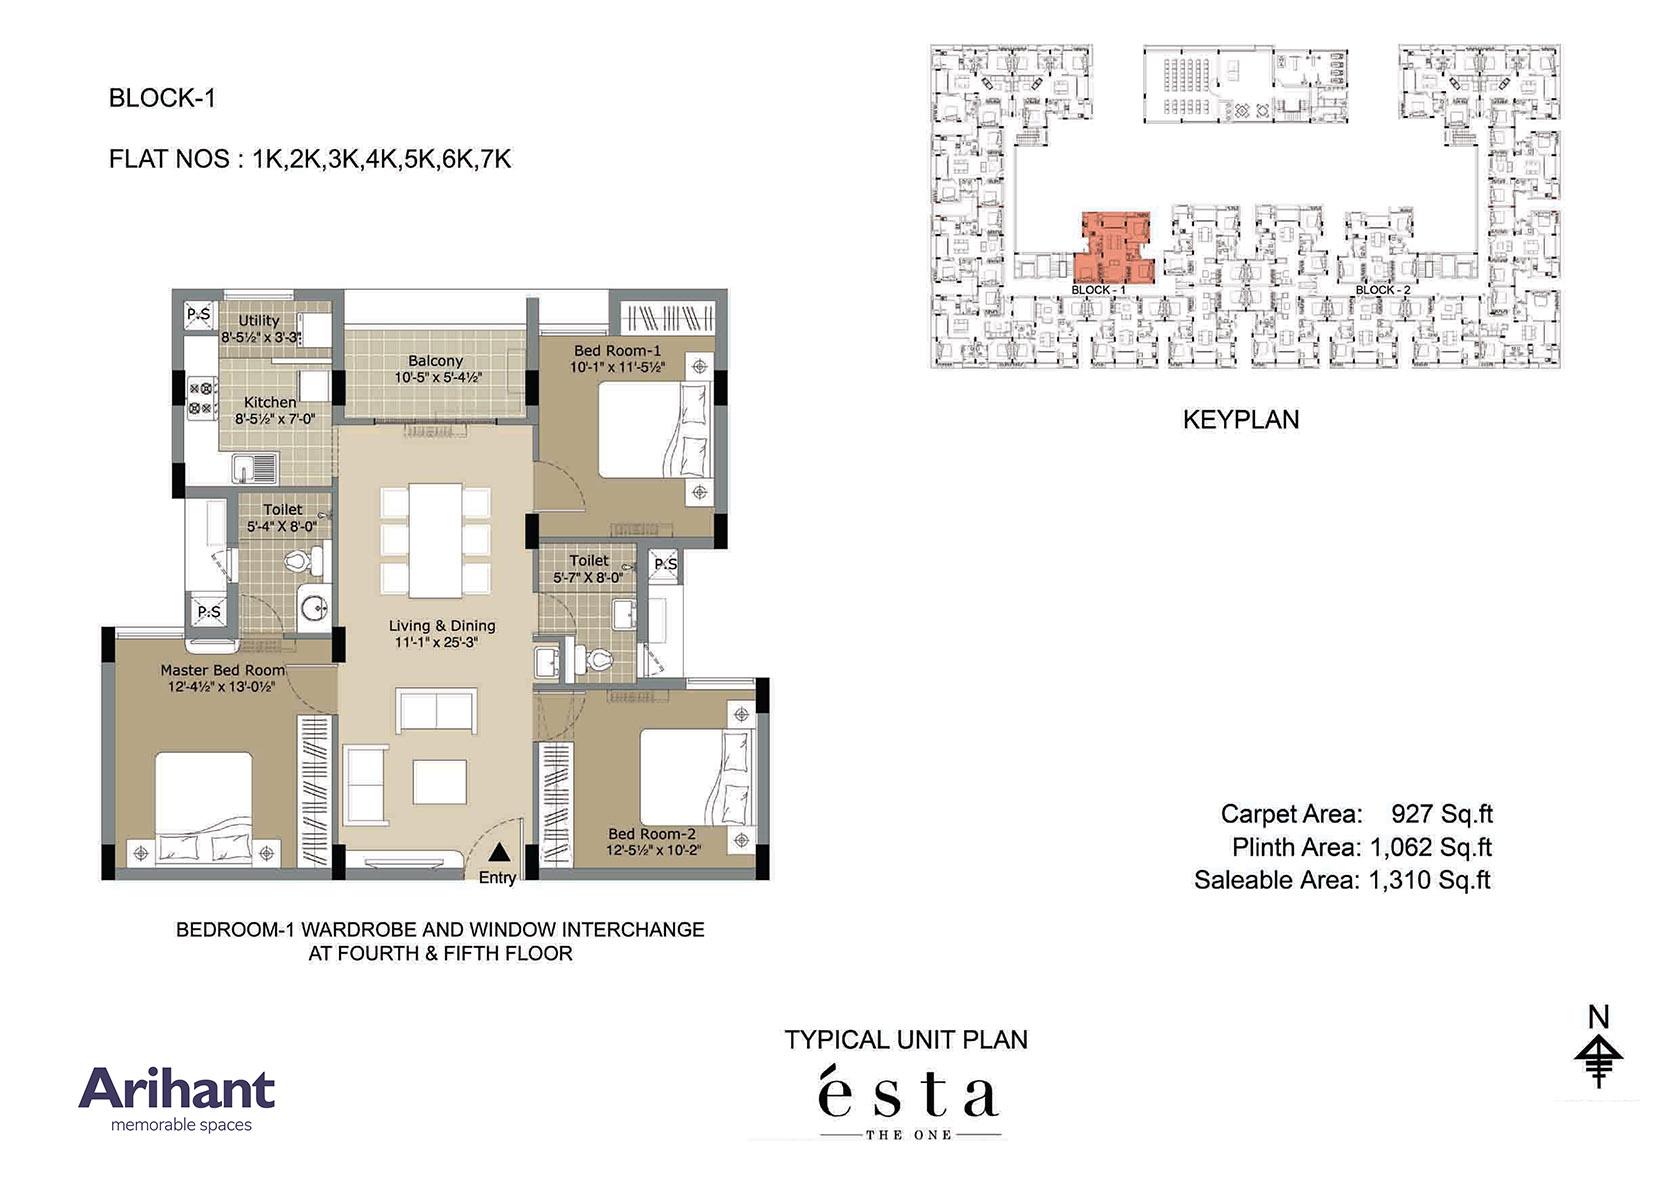 Arihant - Esta_Typical Unit Plan - Block 1 - Type K